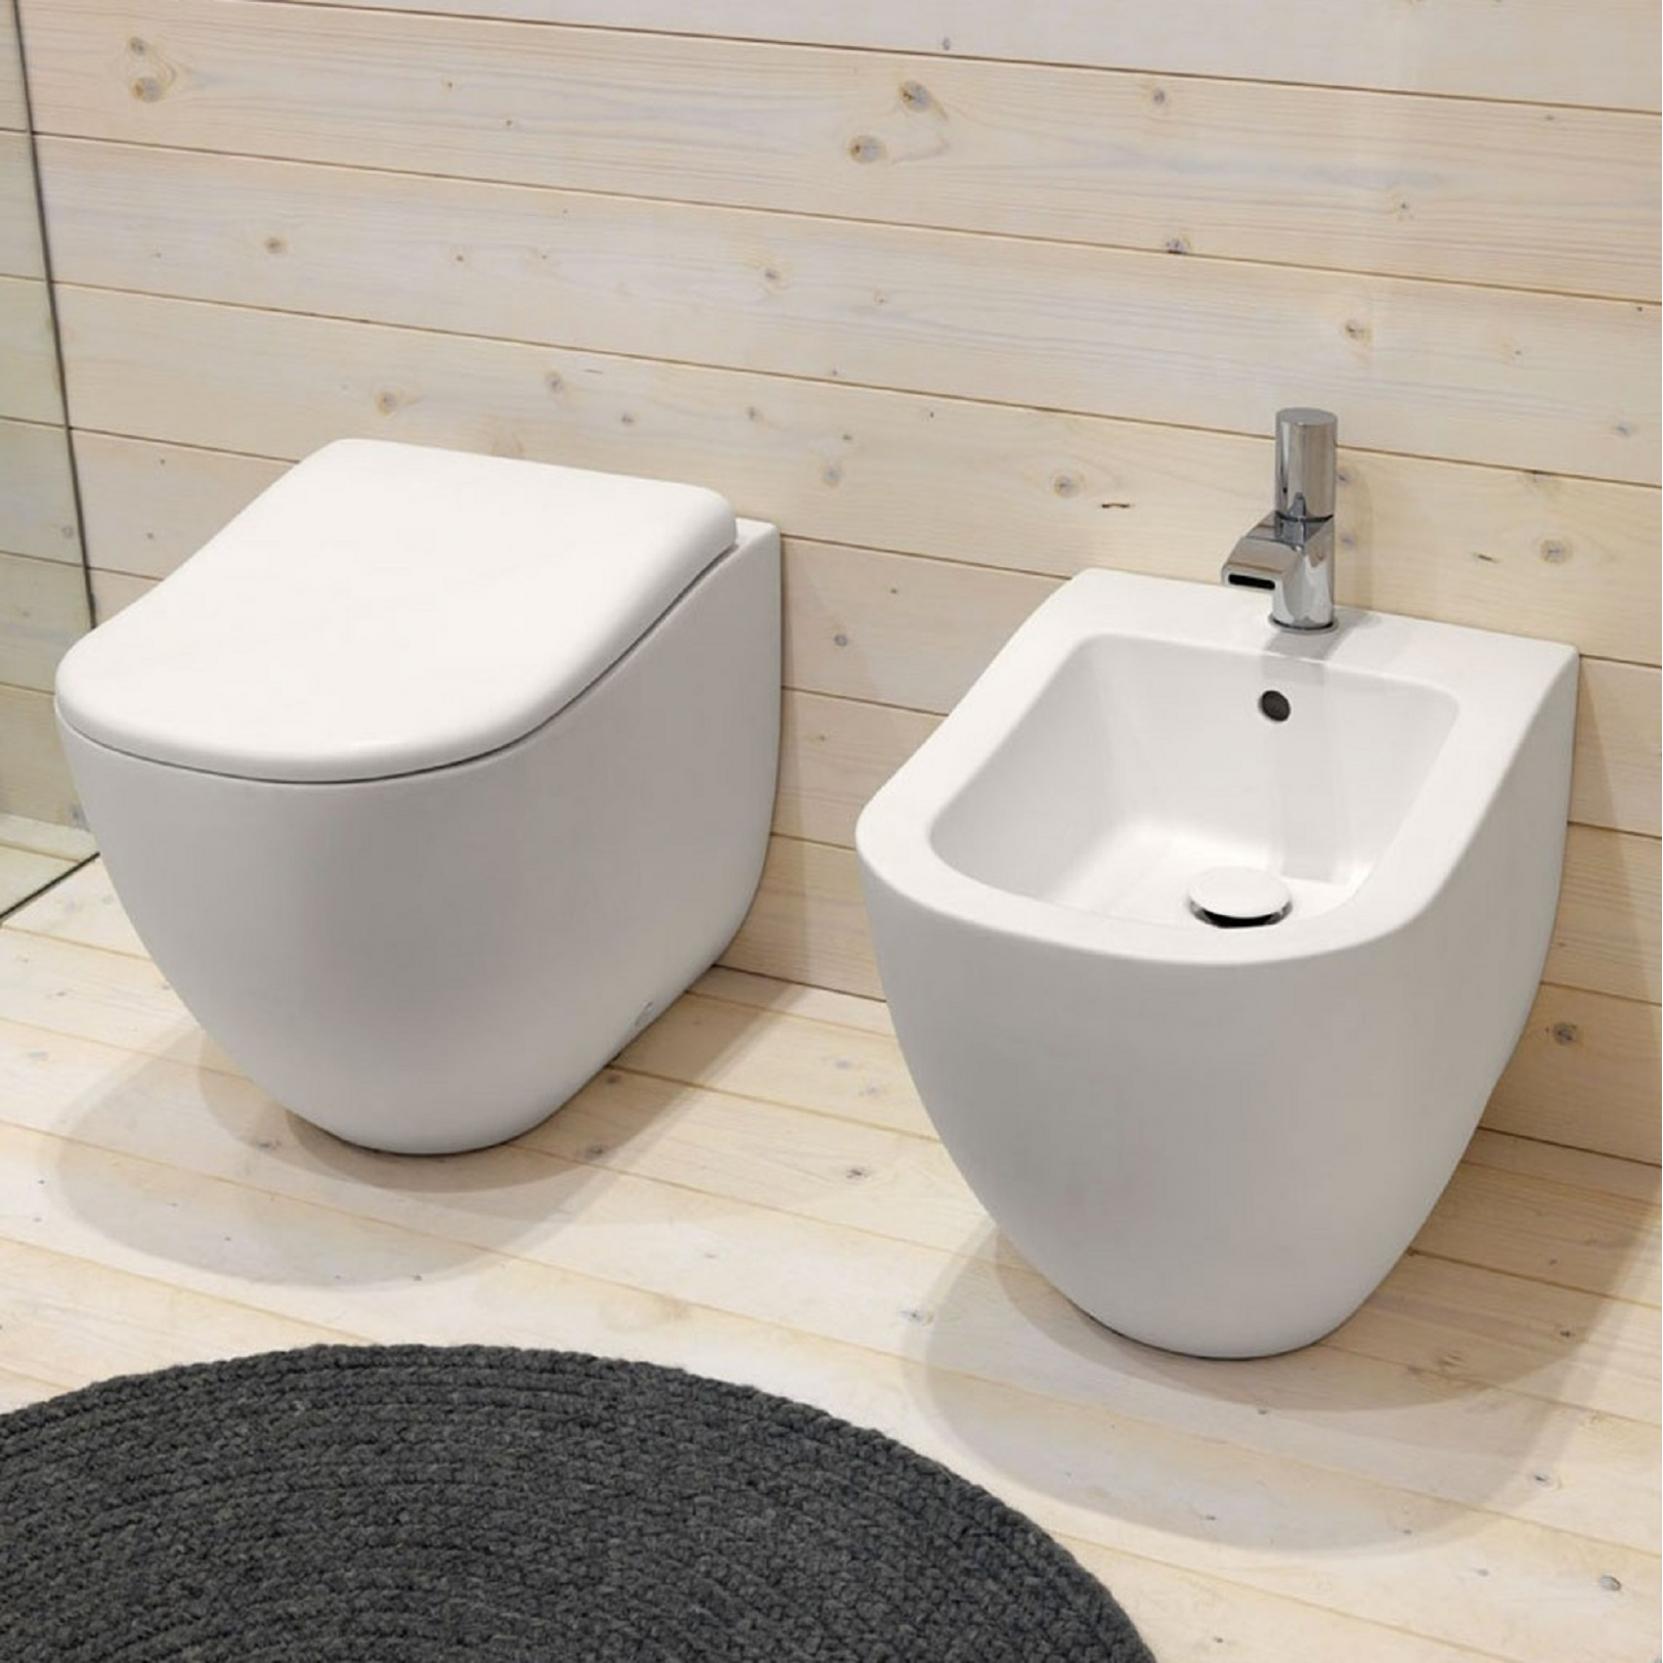 Stupendous Cielo Fluid Back To Wall Bidet Tattahome Creativecarmelina Interior Chair Design Creativecarmelinacom